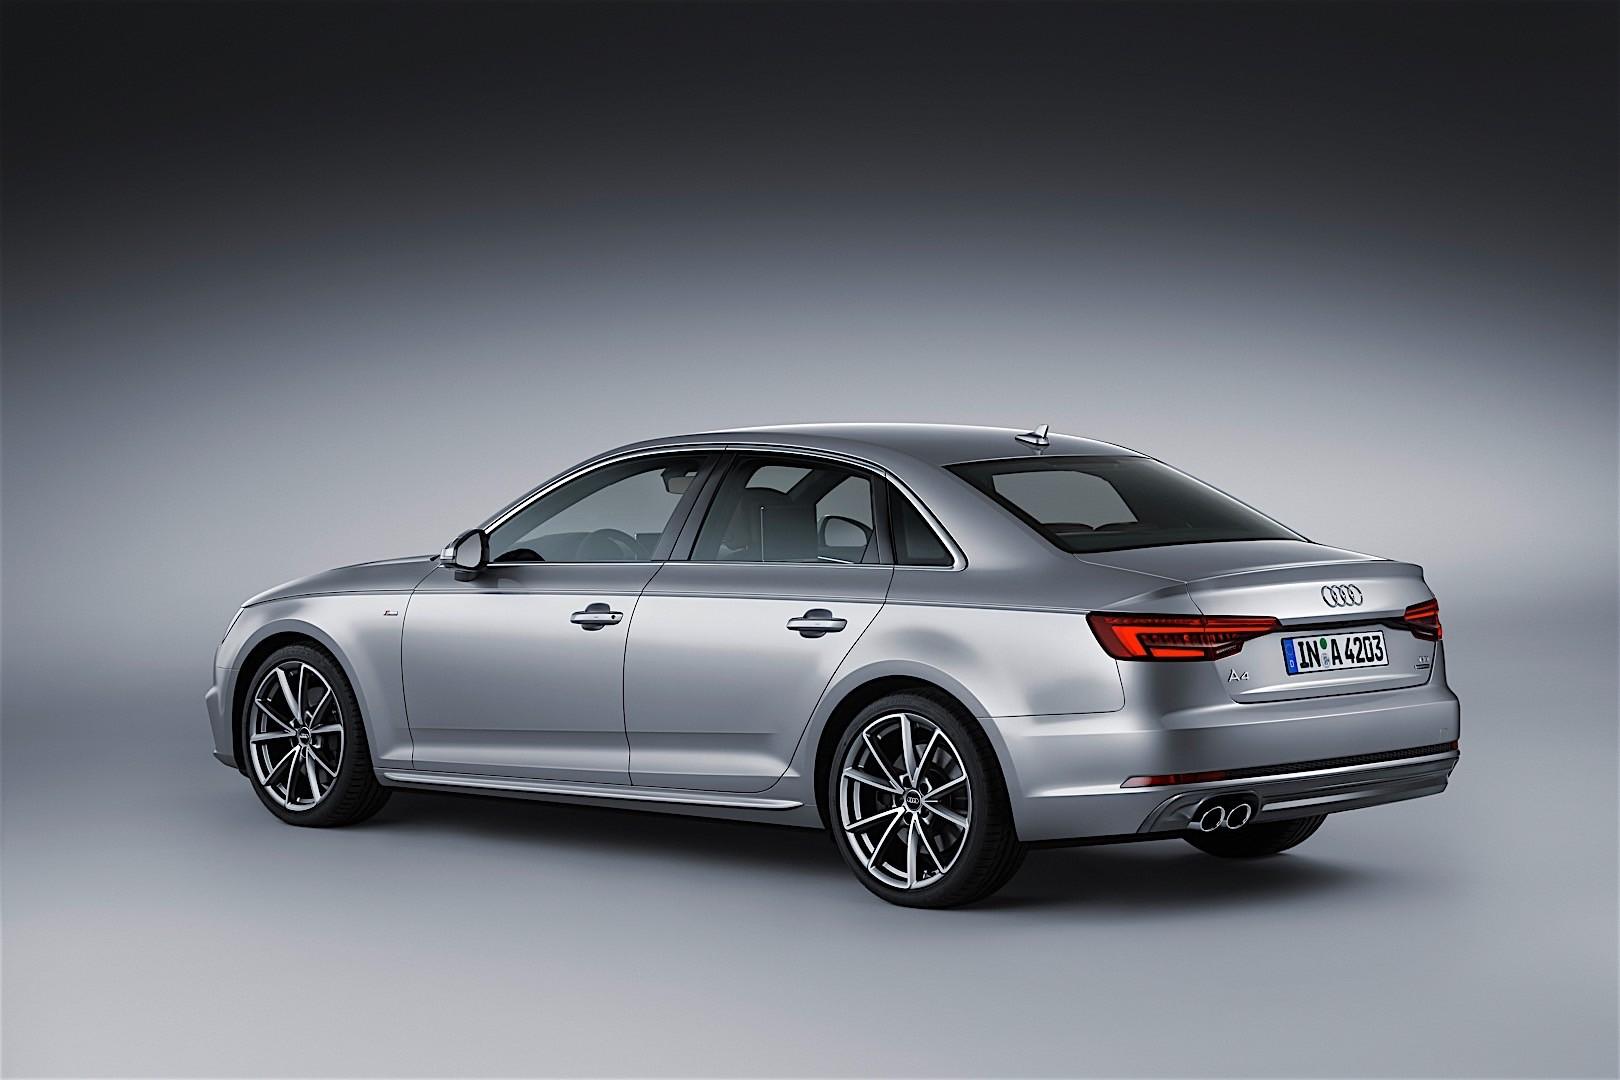 Audi a4 specs photos 2016 2017 2018 autoevolution for Lunghezza audi a4 berlina